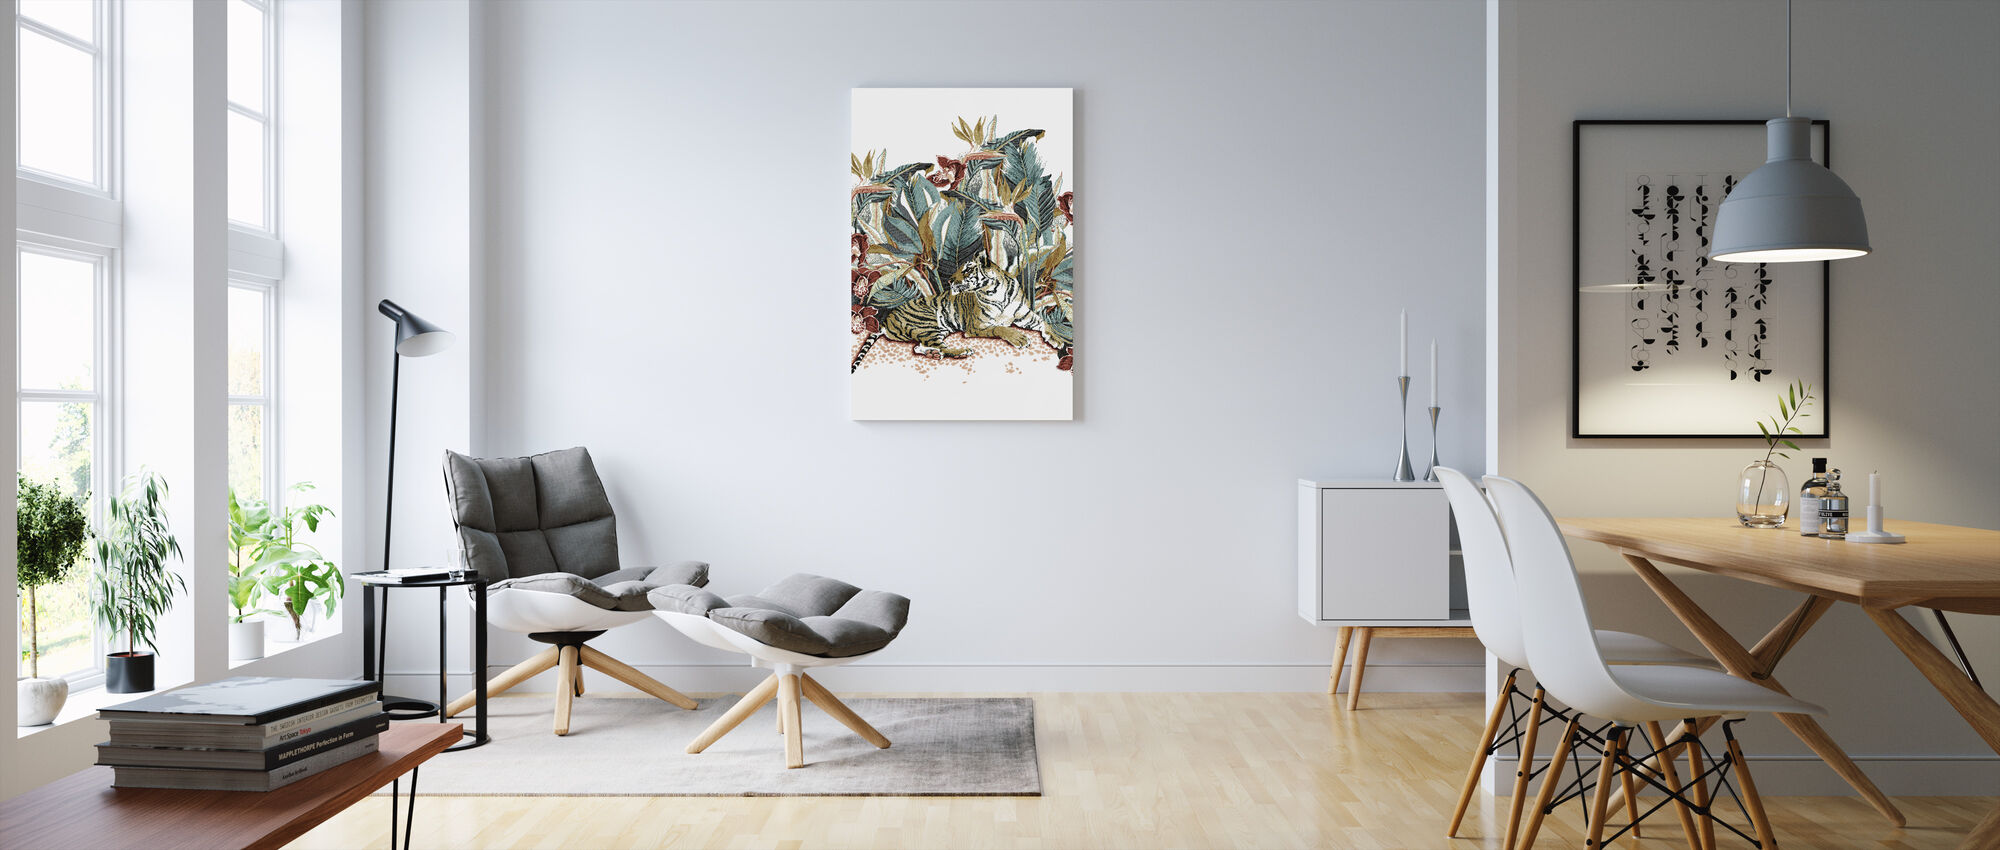 Resting Tigress - Burnt Orange and Teal - Canvas print - Living Room